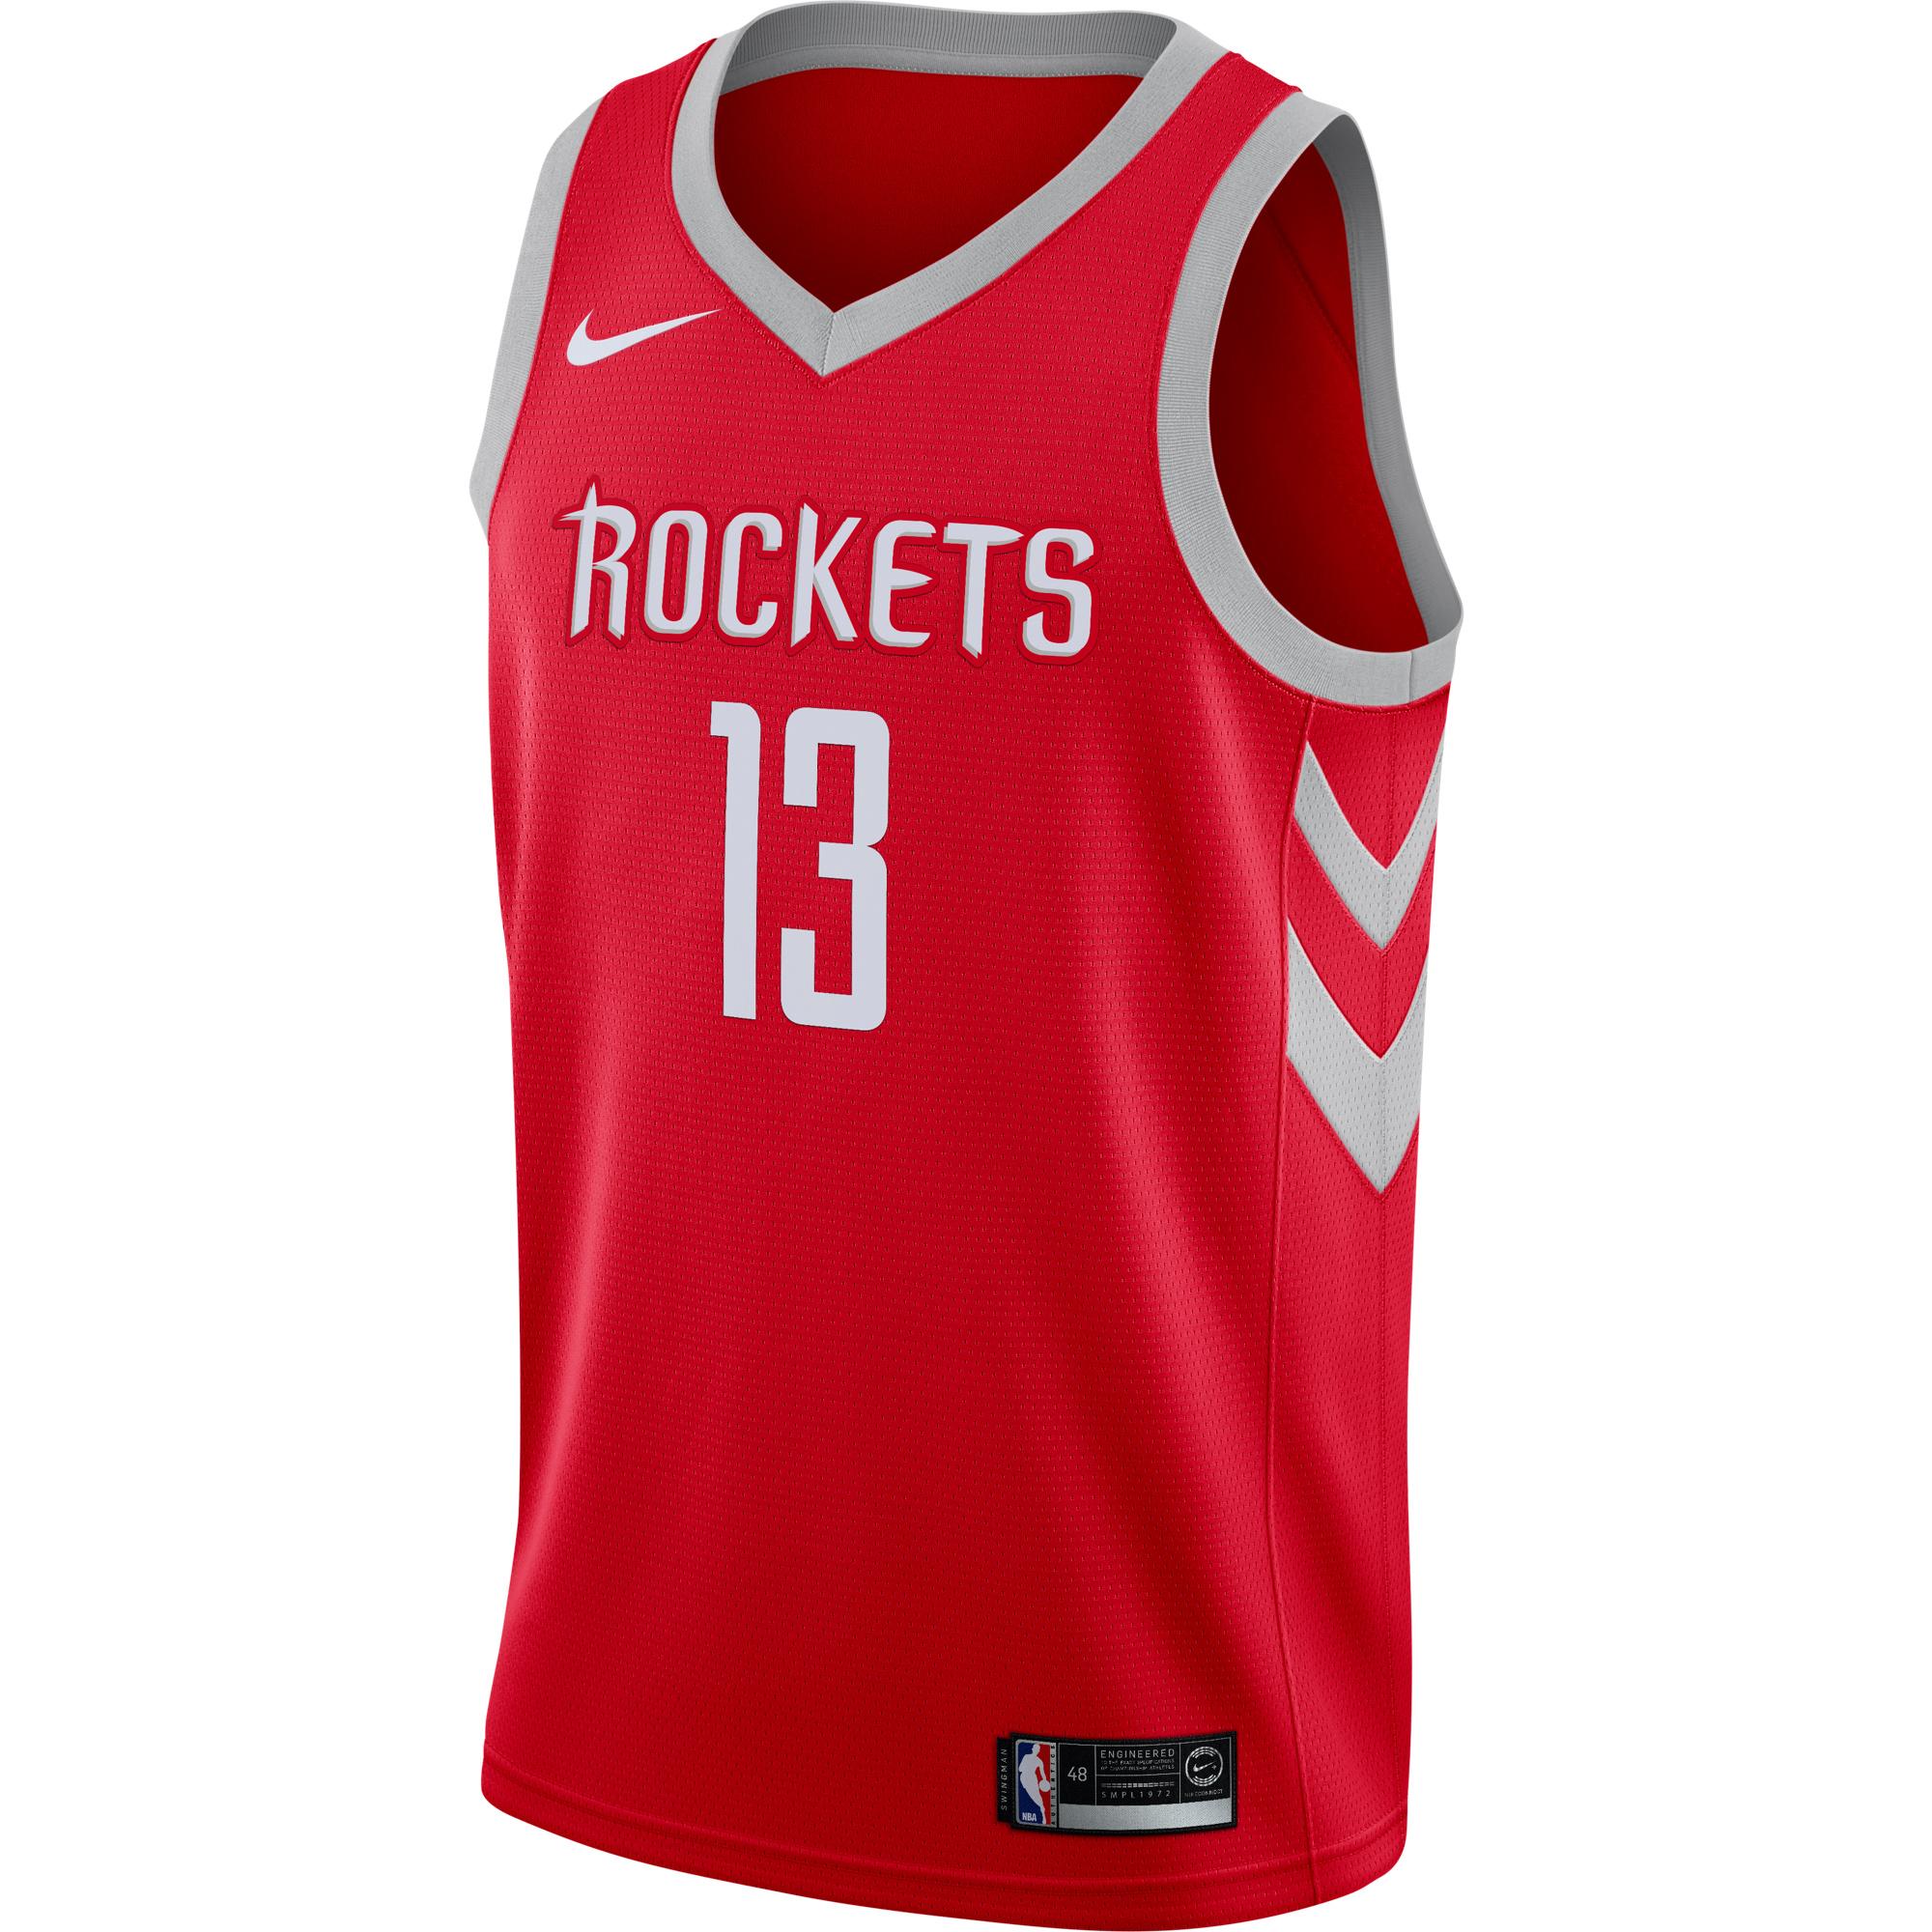 58ebdbe1df6a NBA Jerseys - Walmart.com